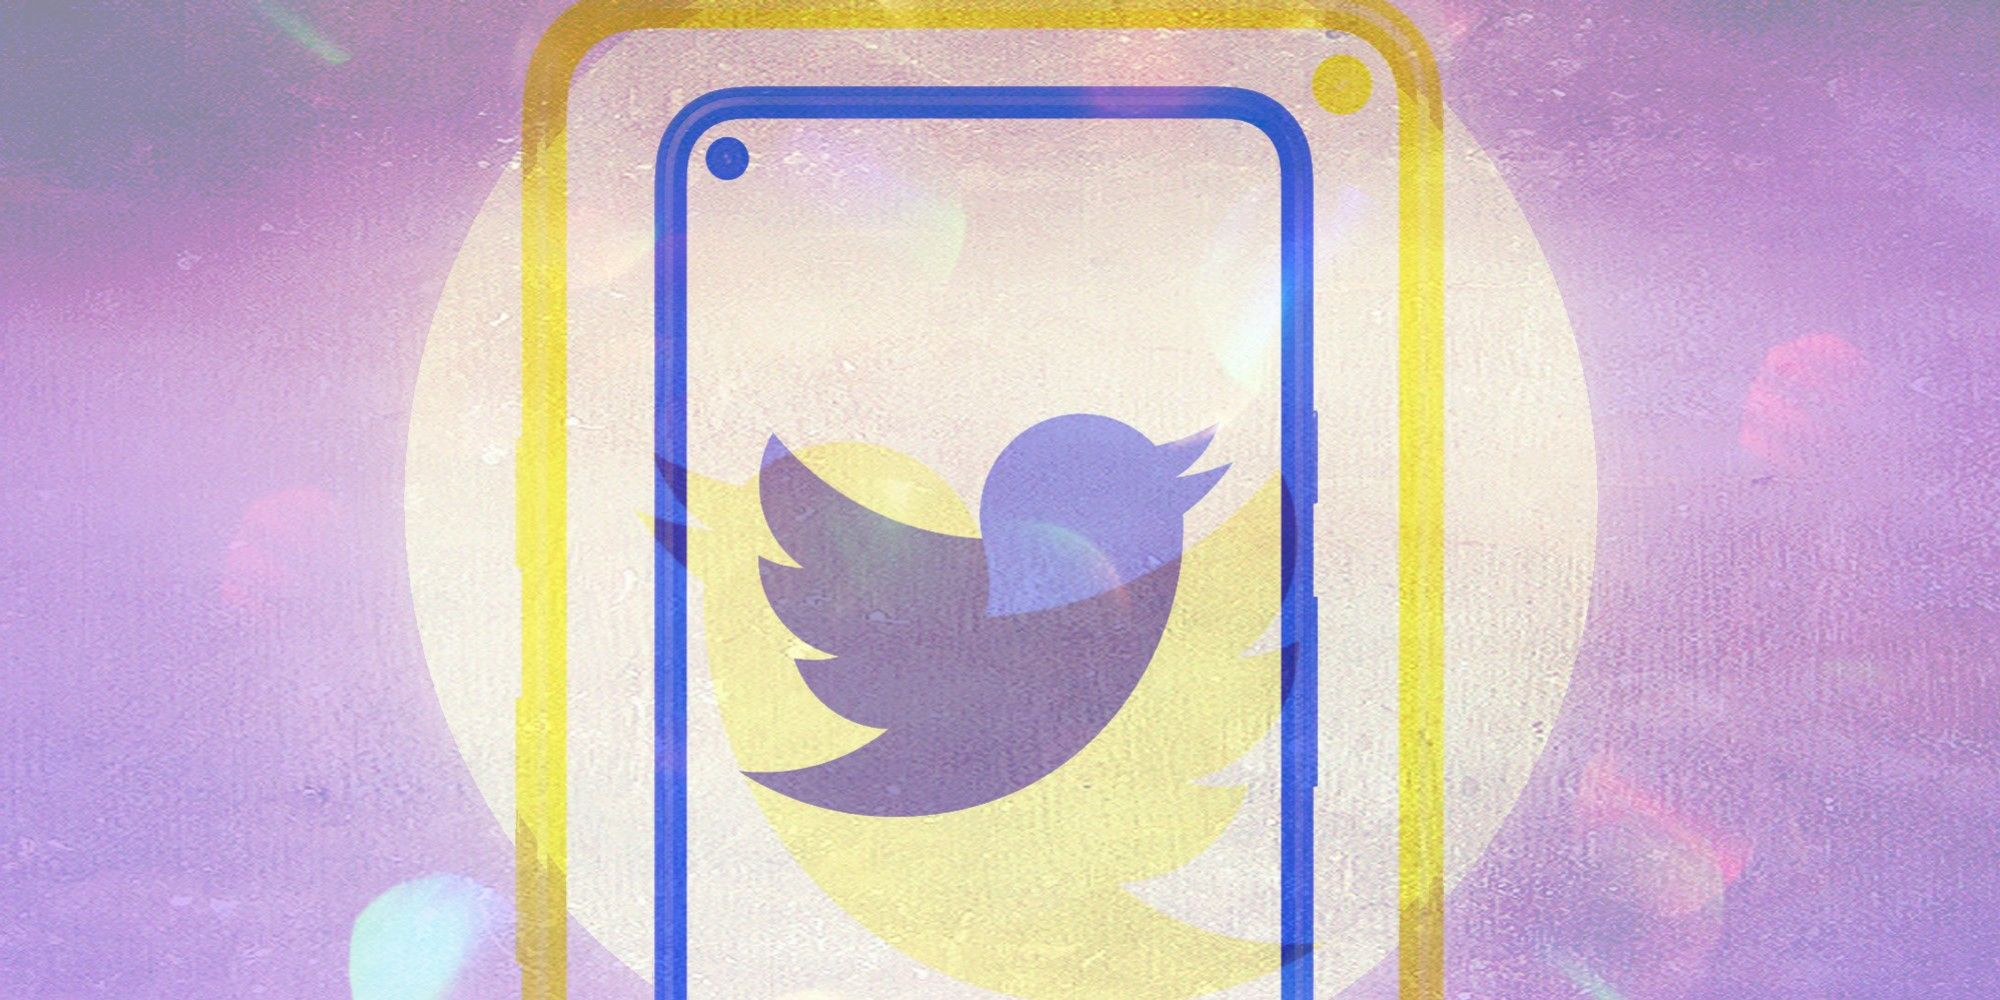 The Next Fleets? Are <b>Twitter's</b> New 'Communities' Doomed To Fail - Screen Rant thumbnail